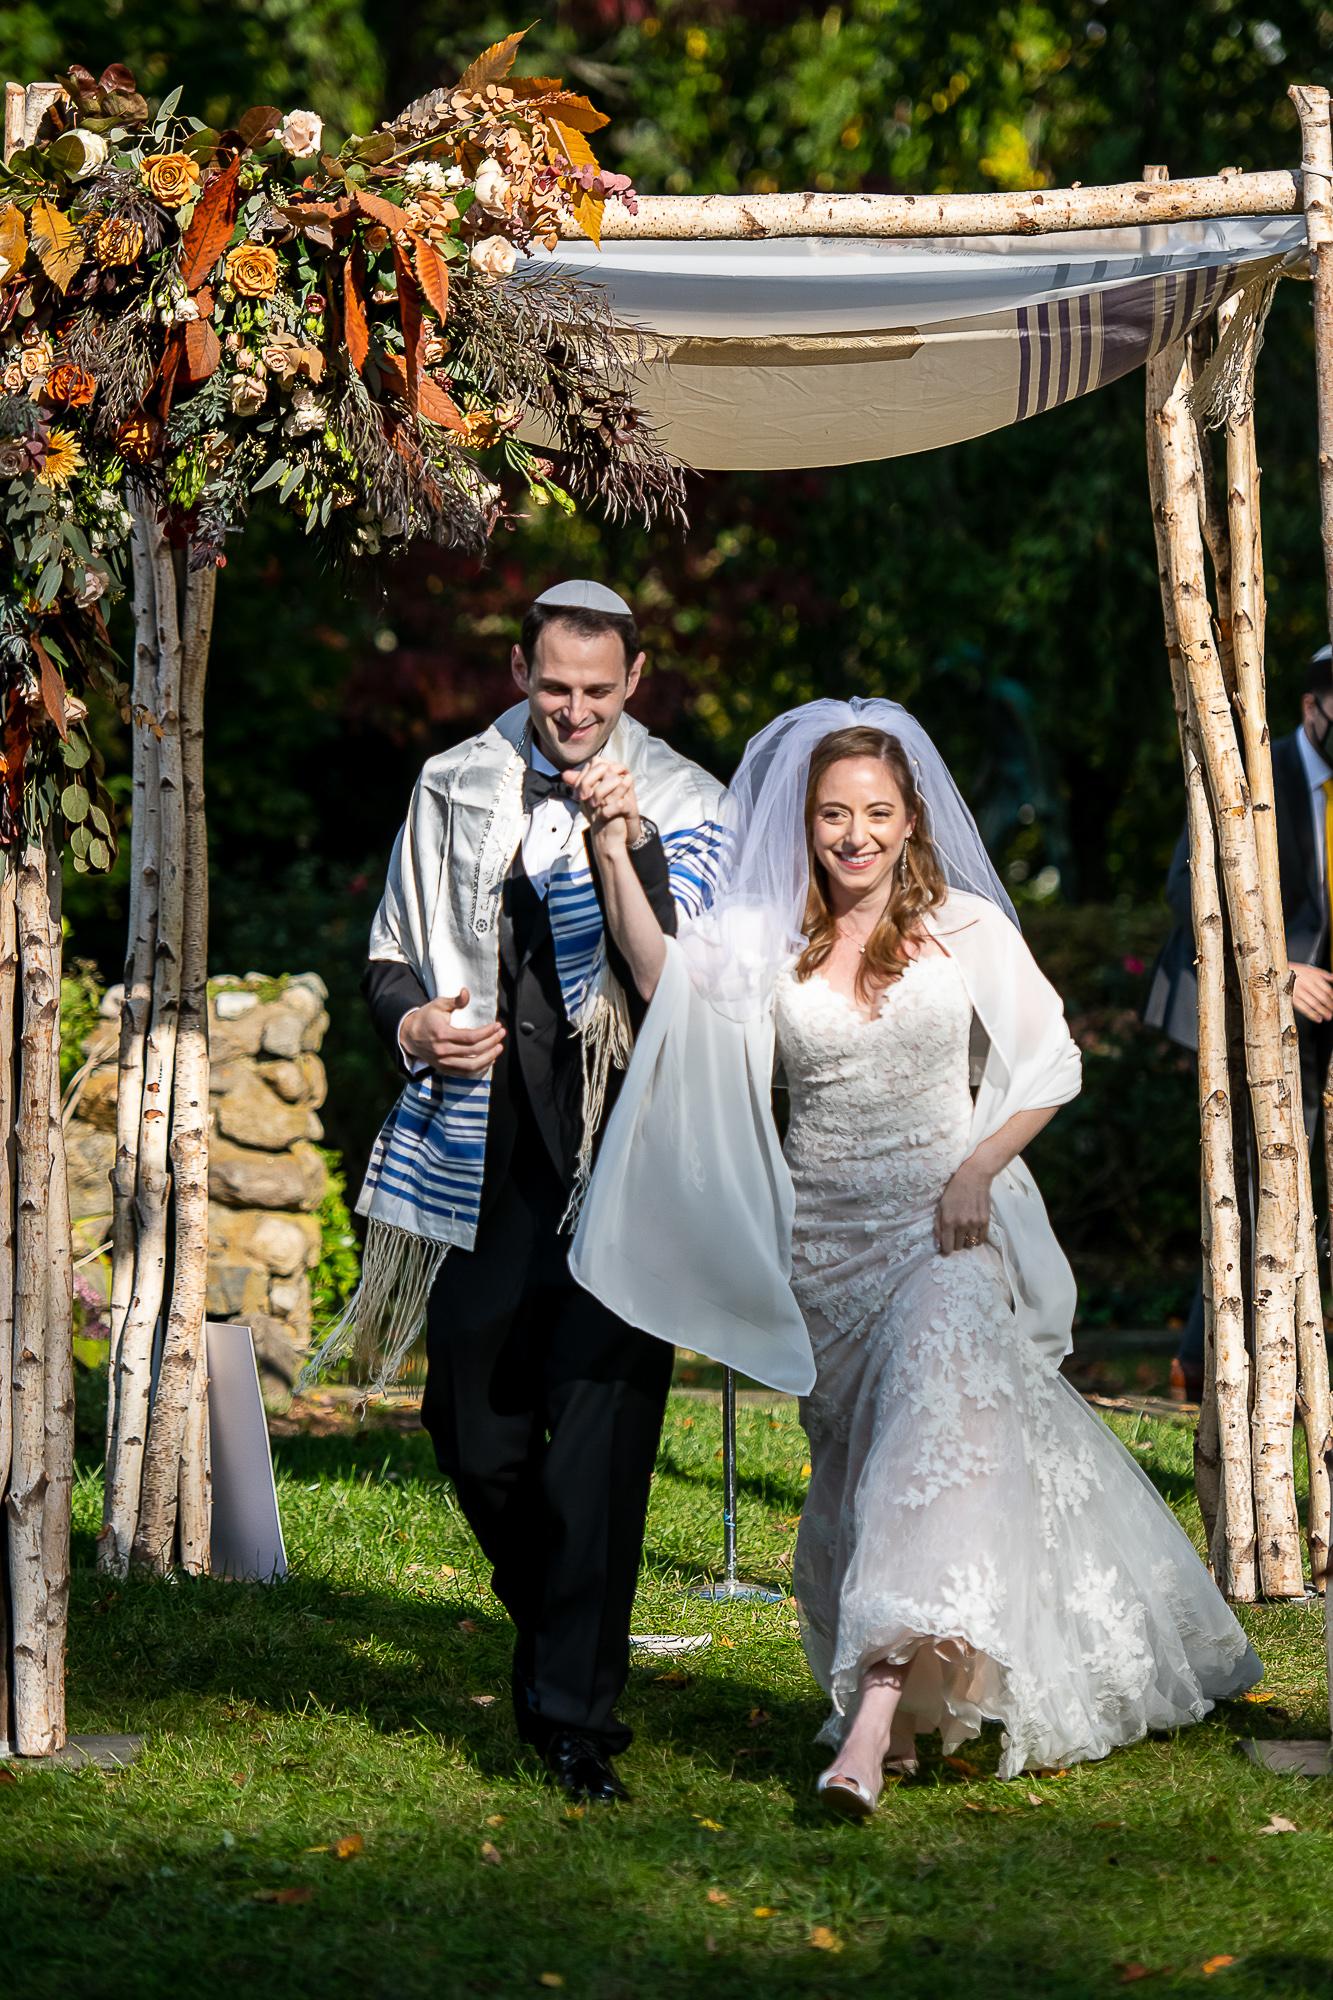 Erica & Michael's micro-wedding at Bet Am Shalom; photos by Christopher Duggan